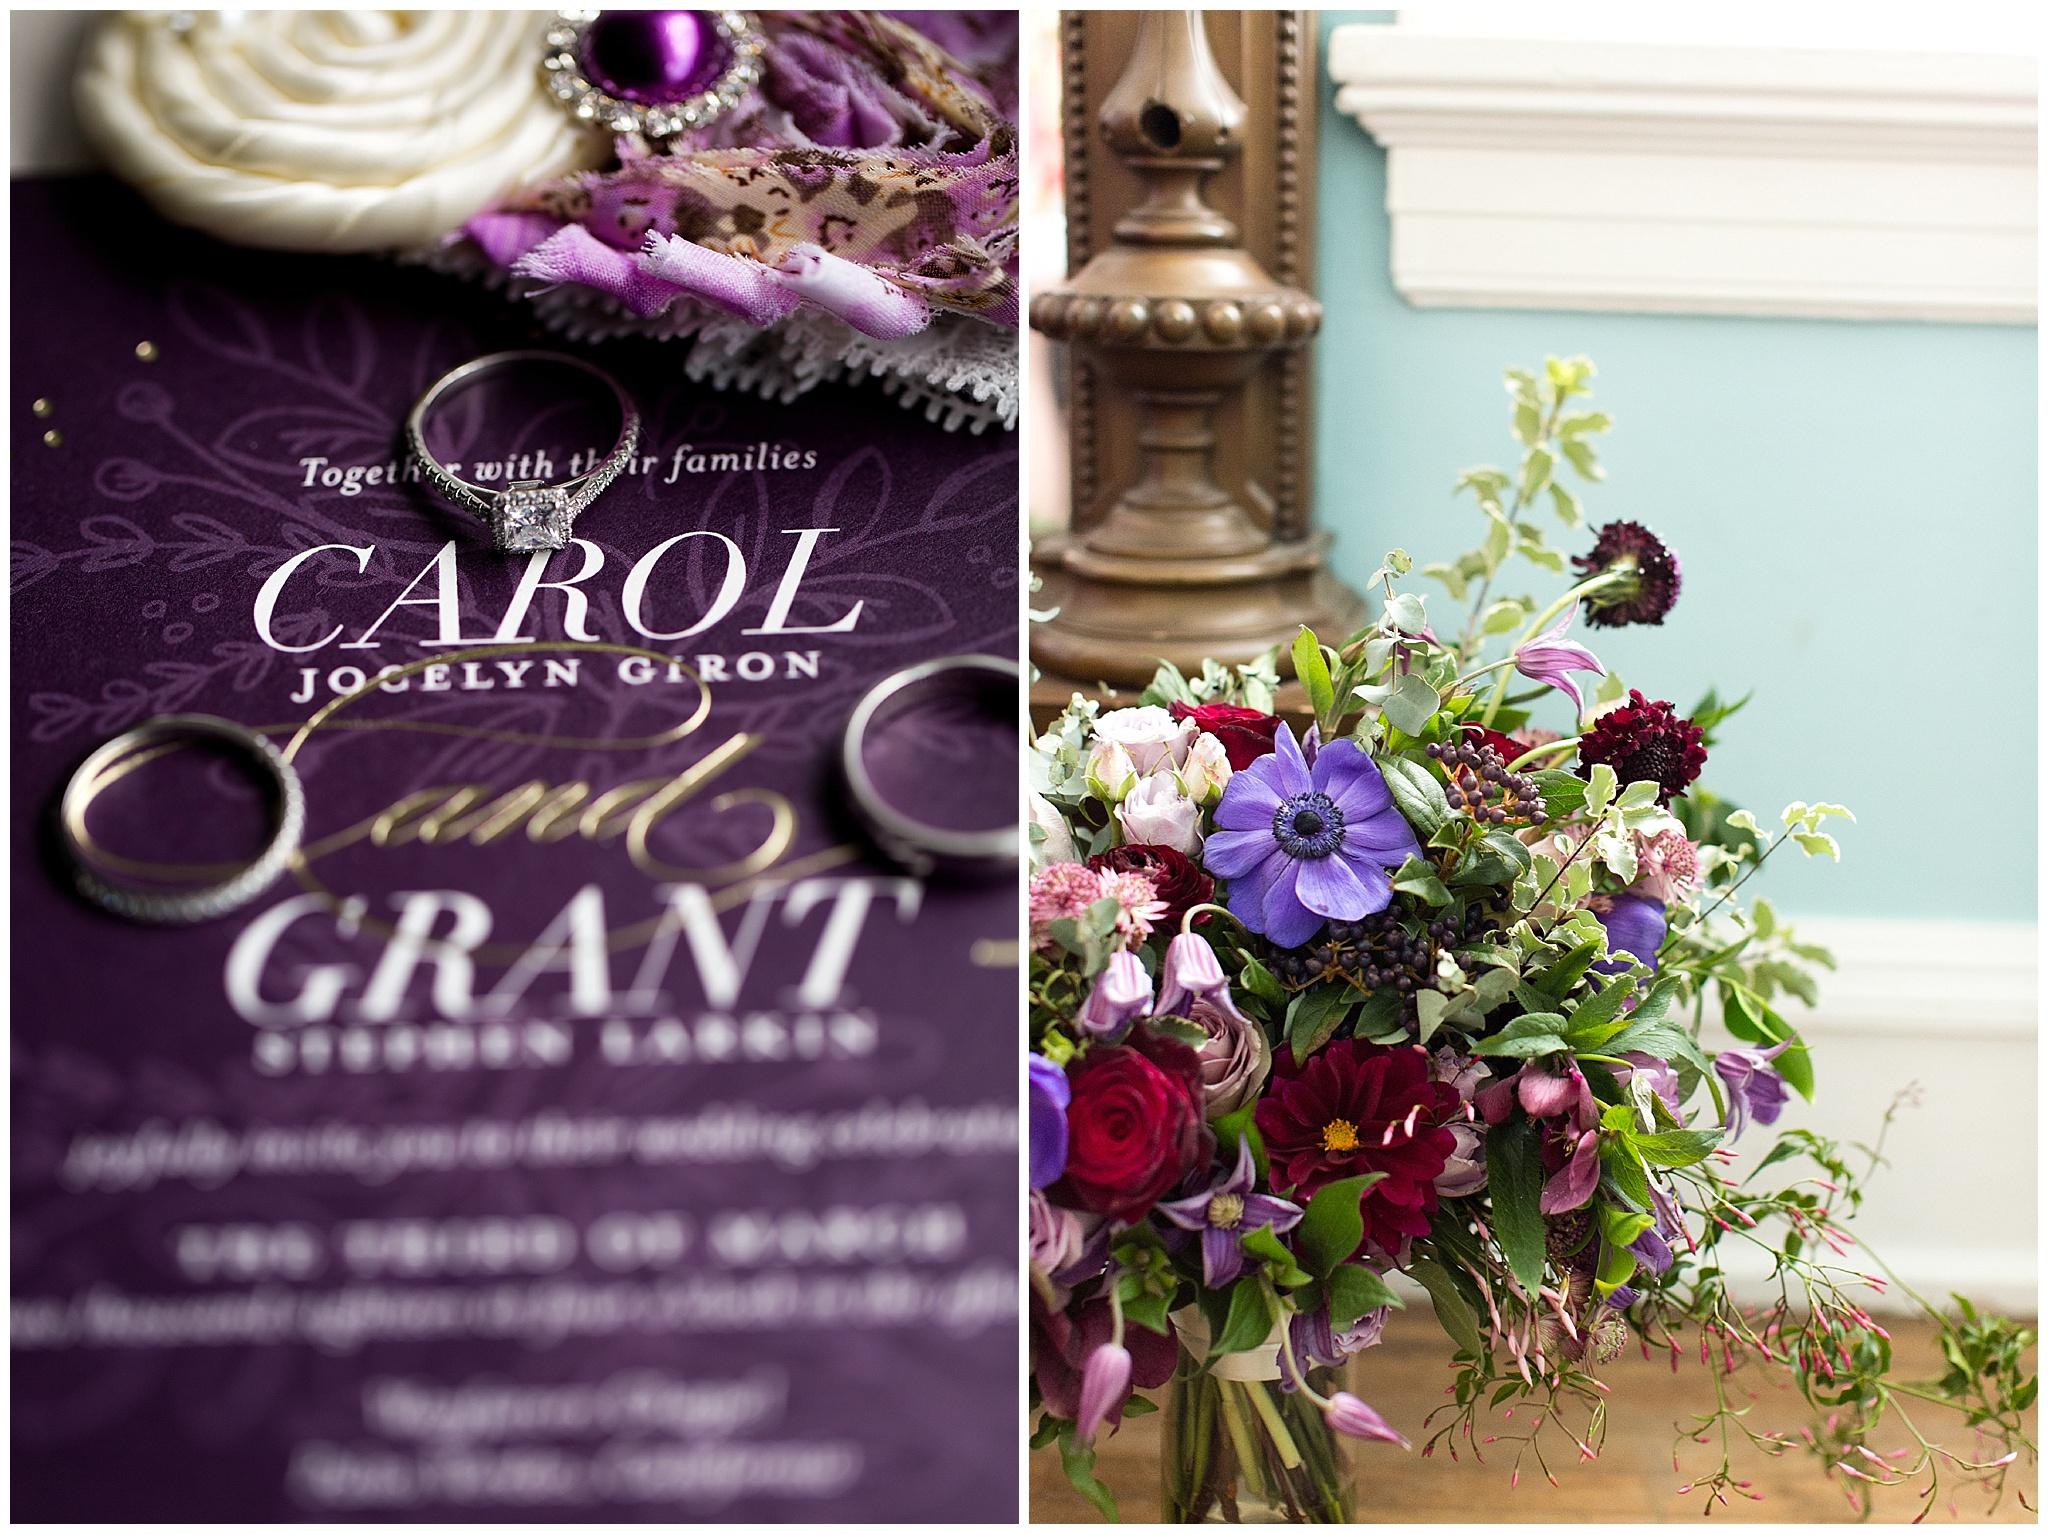 Carol_and_Grant_Wedding_3-3-18-7006.jpg